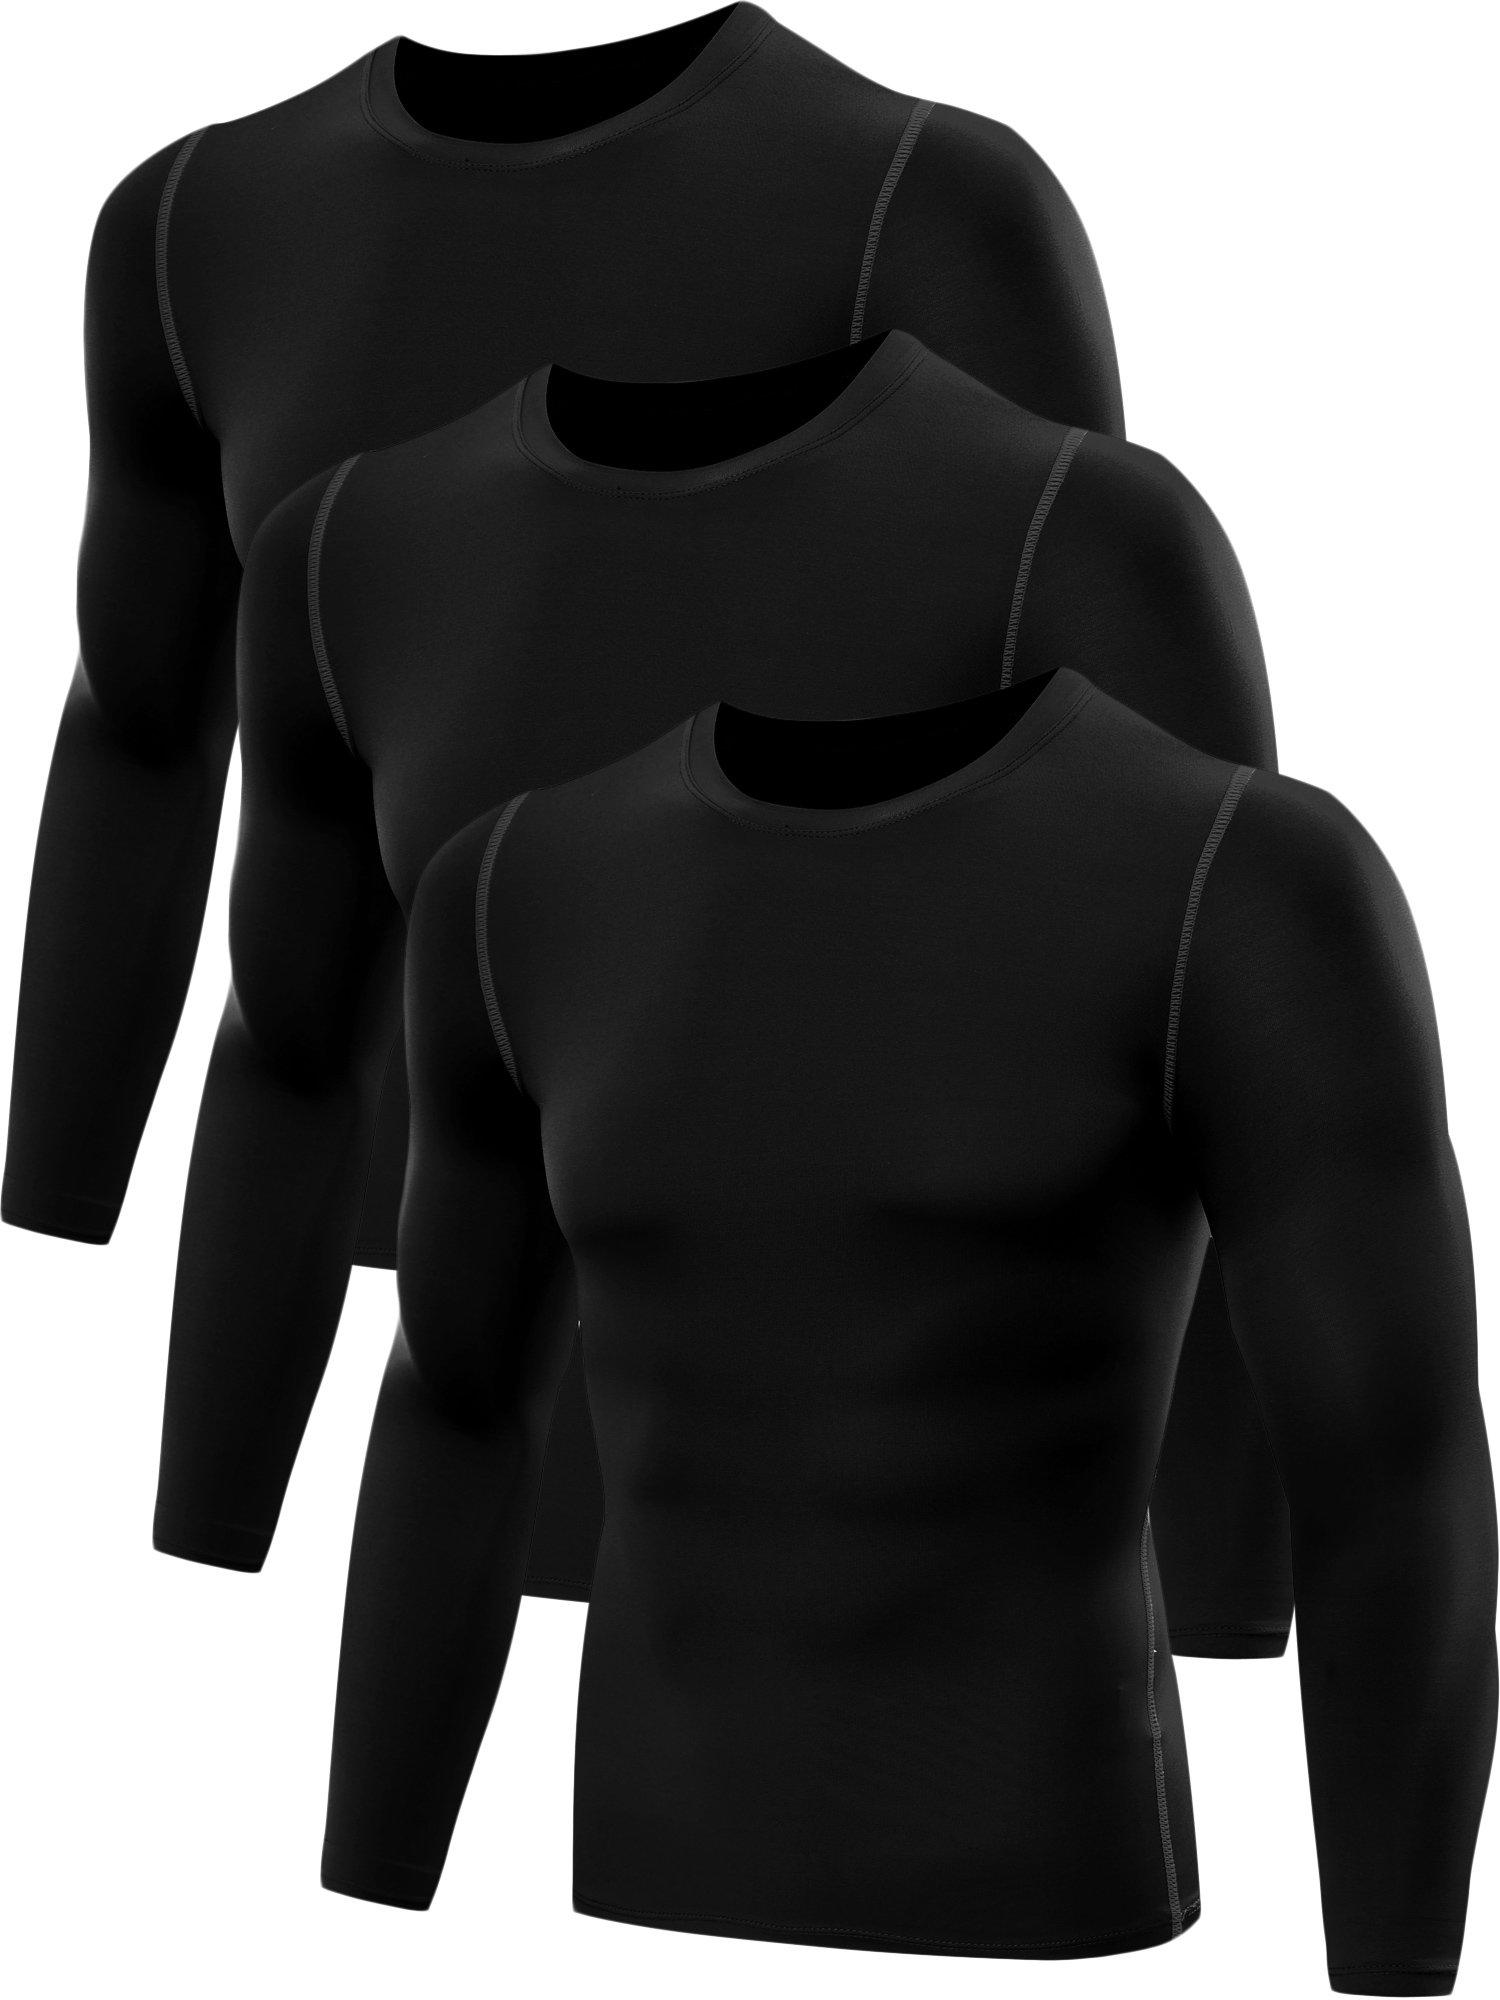 Neleus Men's 3 Pack Athletic Compression Sport Running T Shirt Long Sleeve Base Layer,Black,US S,EU M